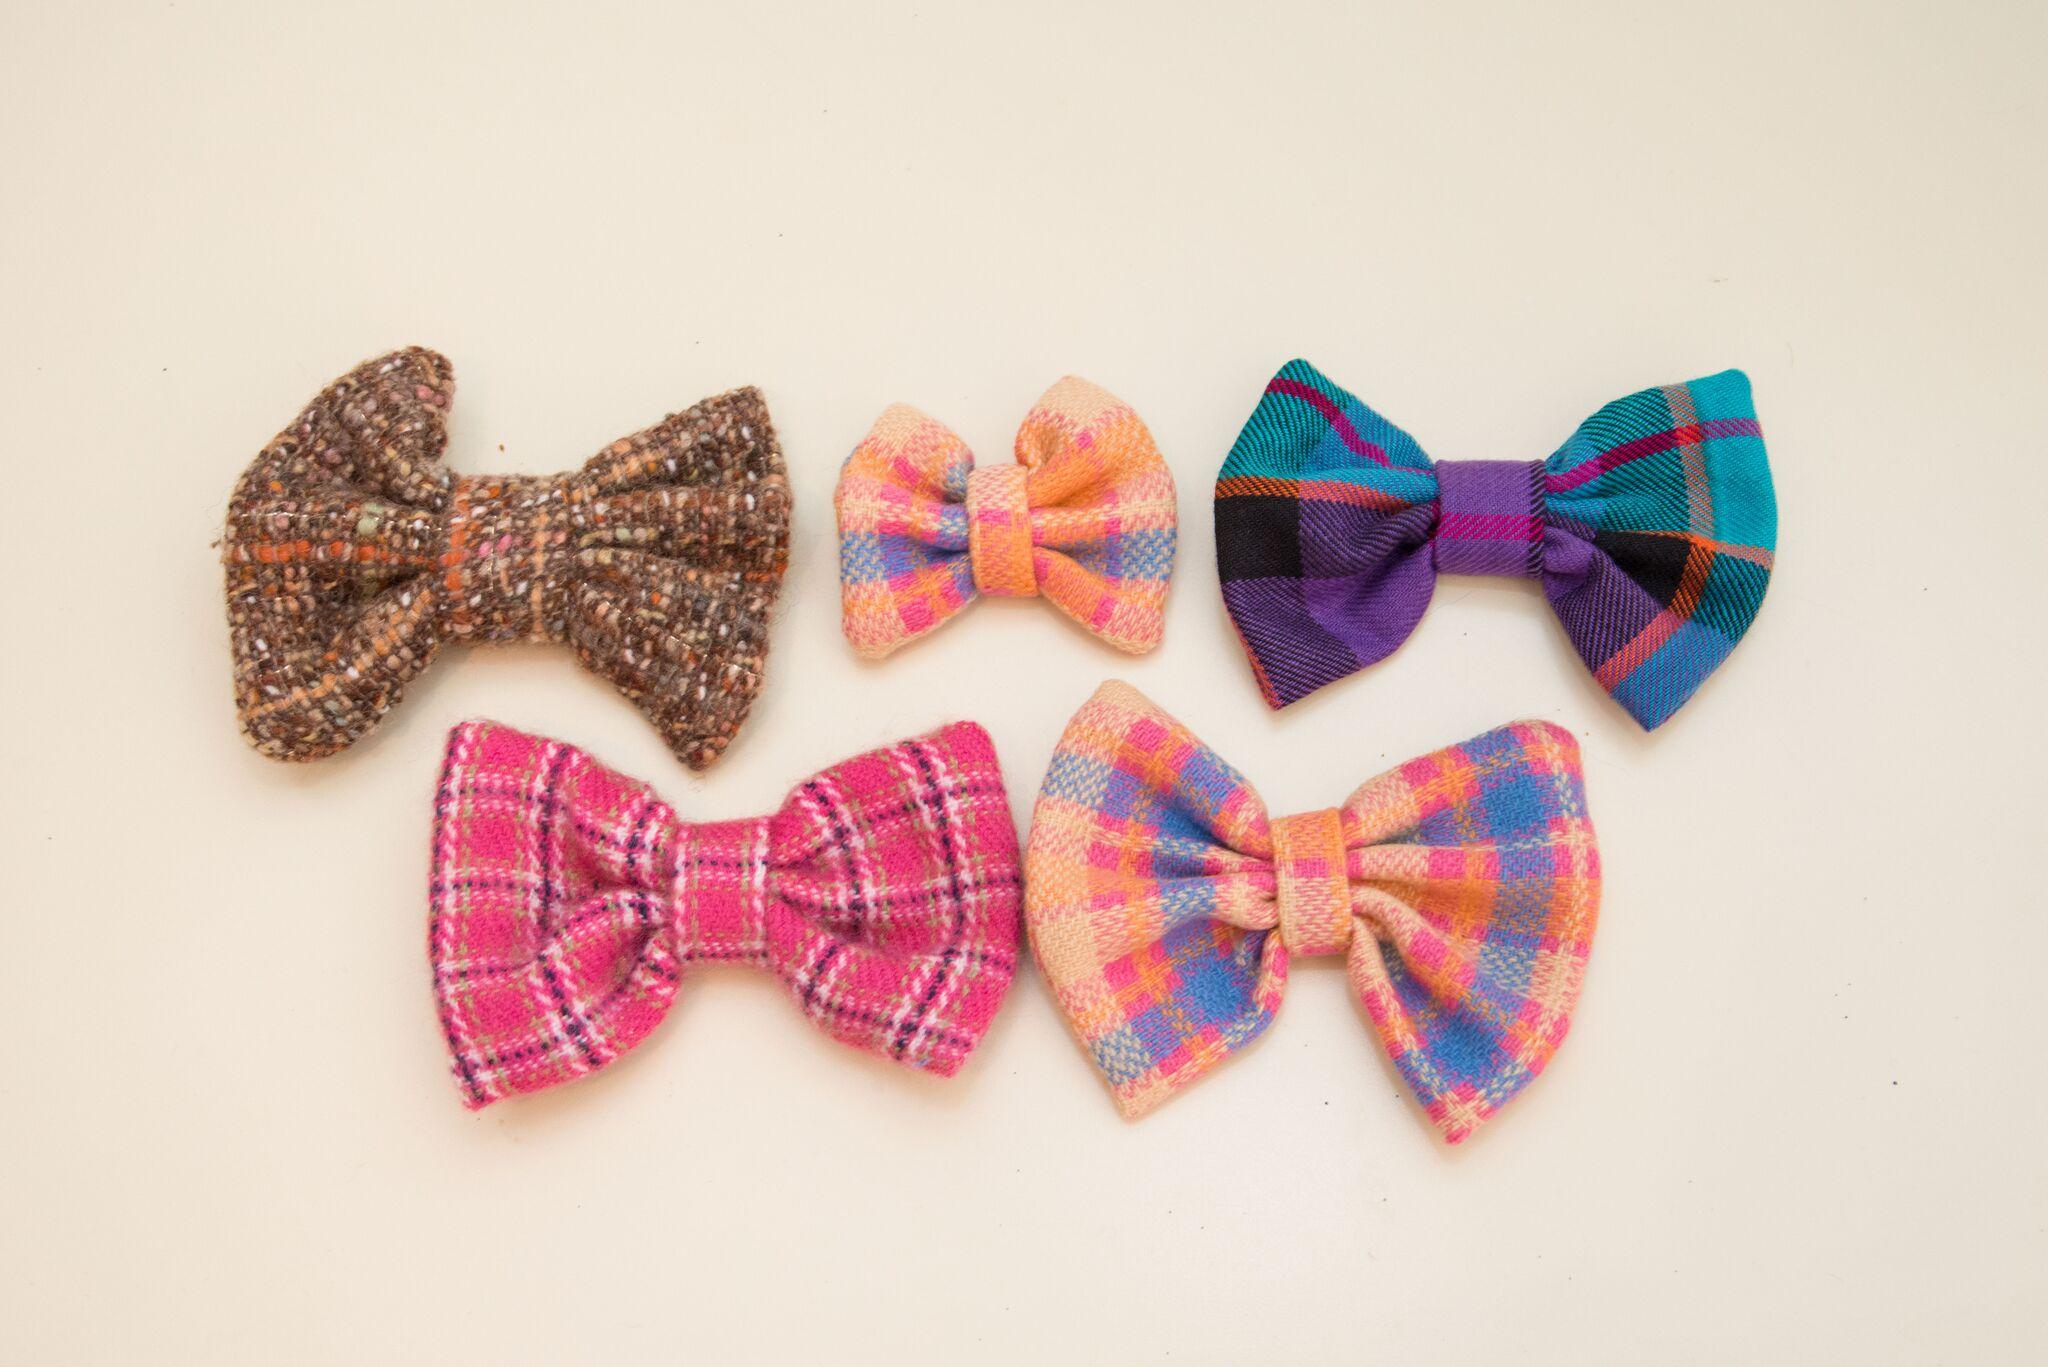 Doggie bow ties